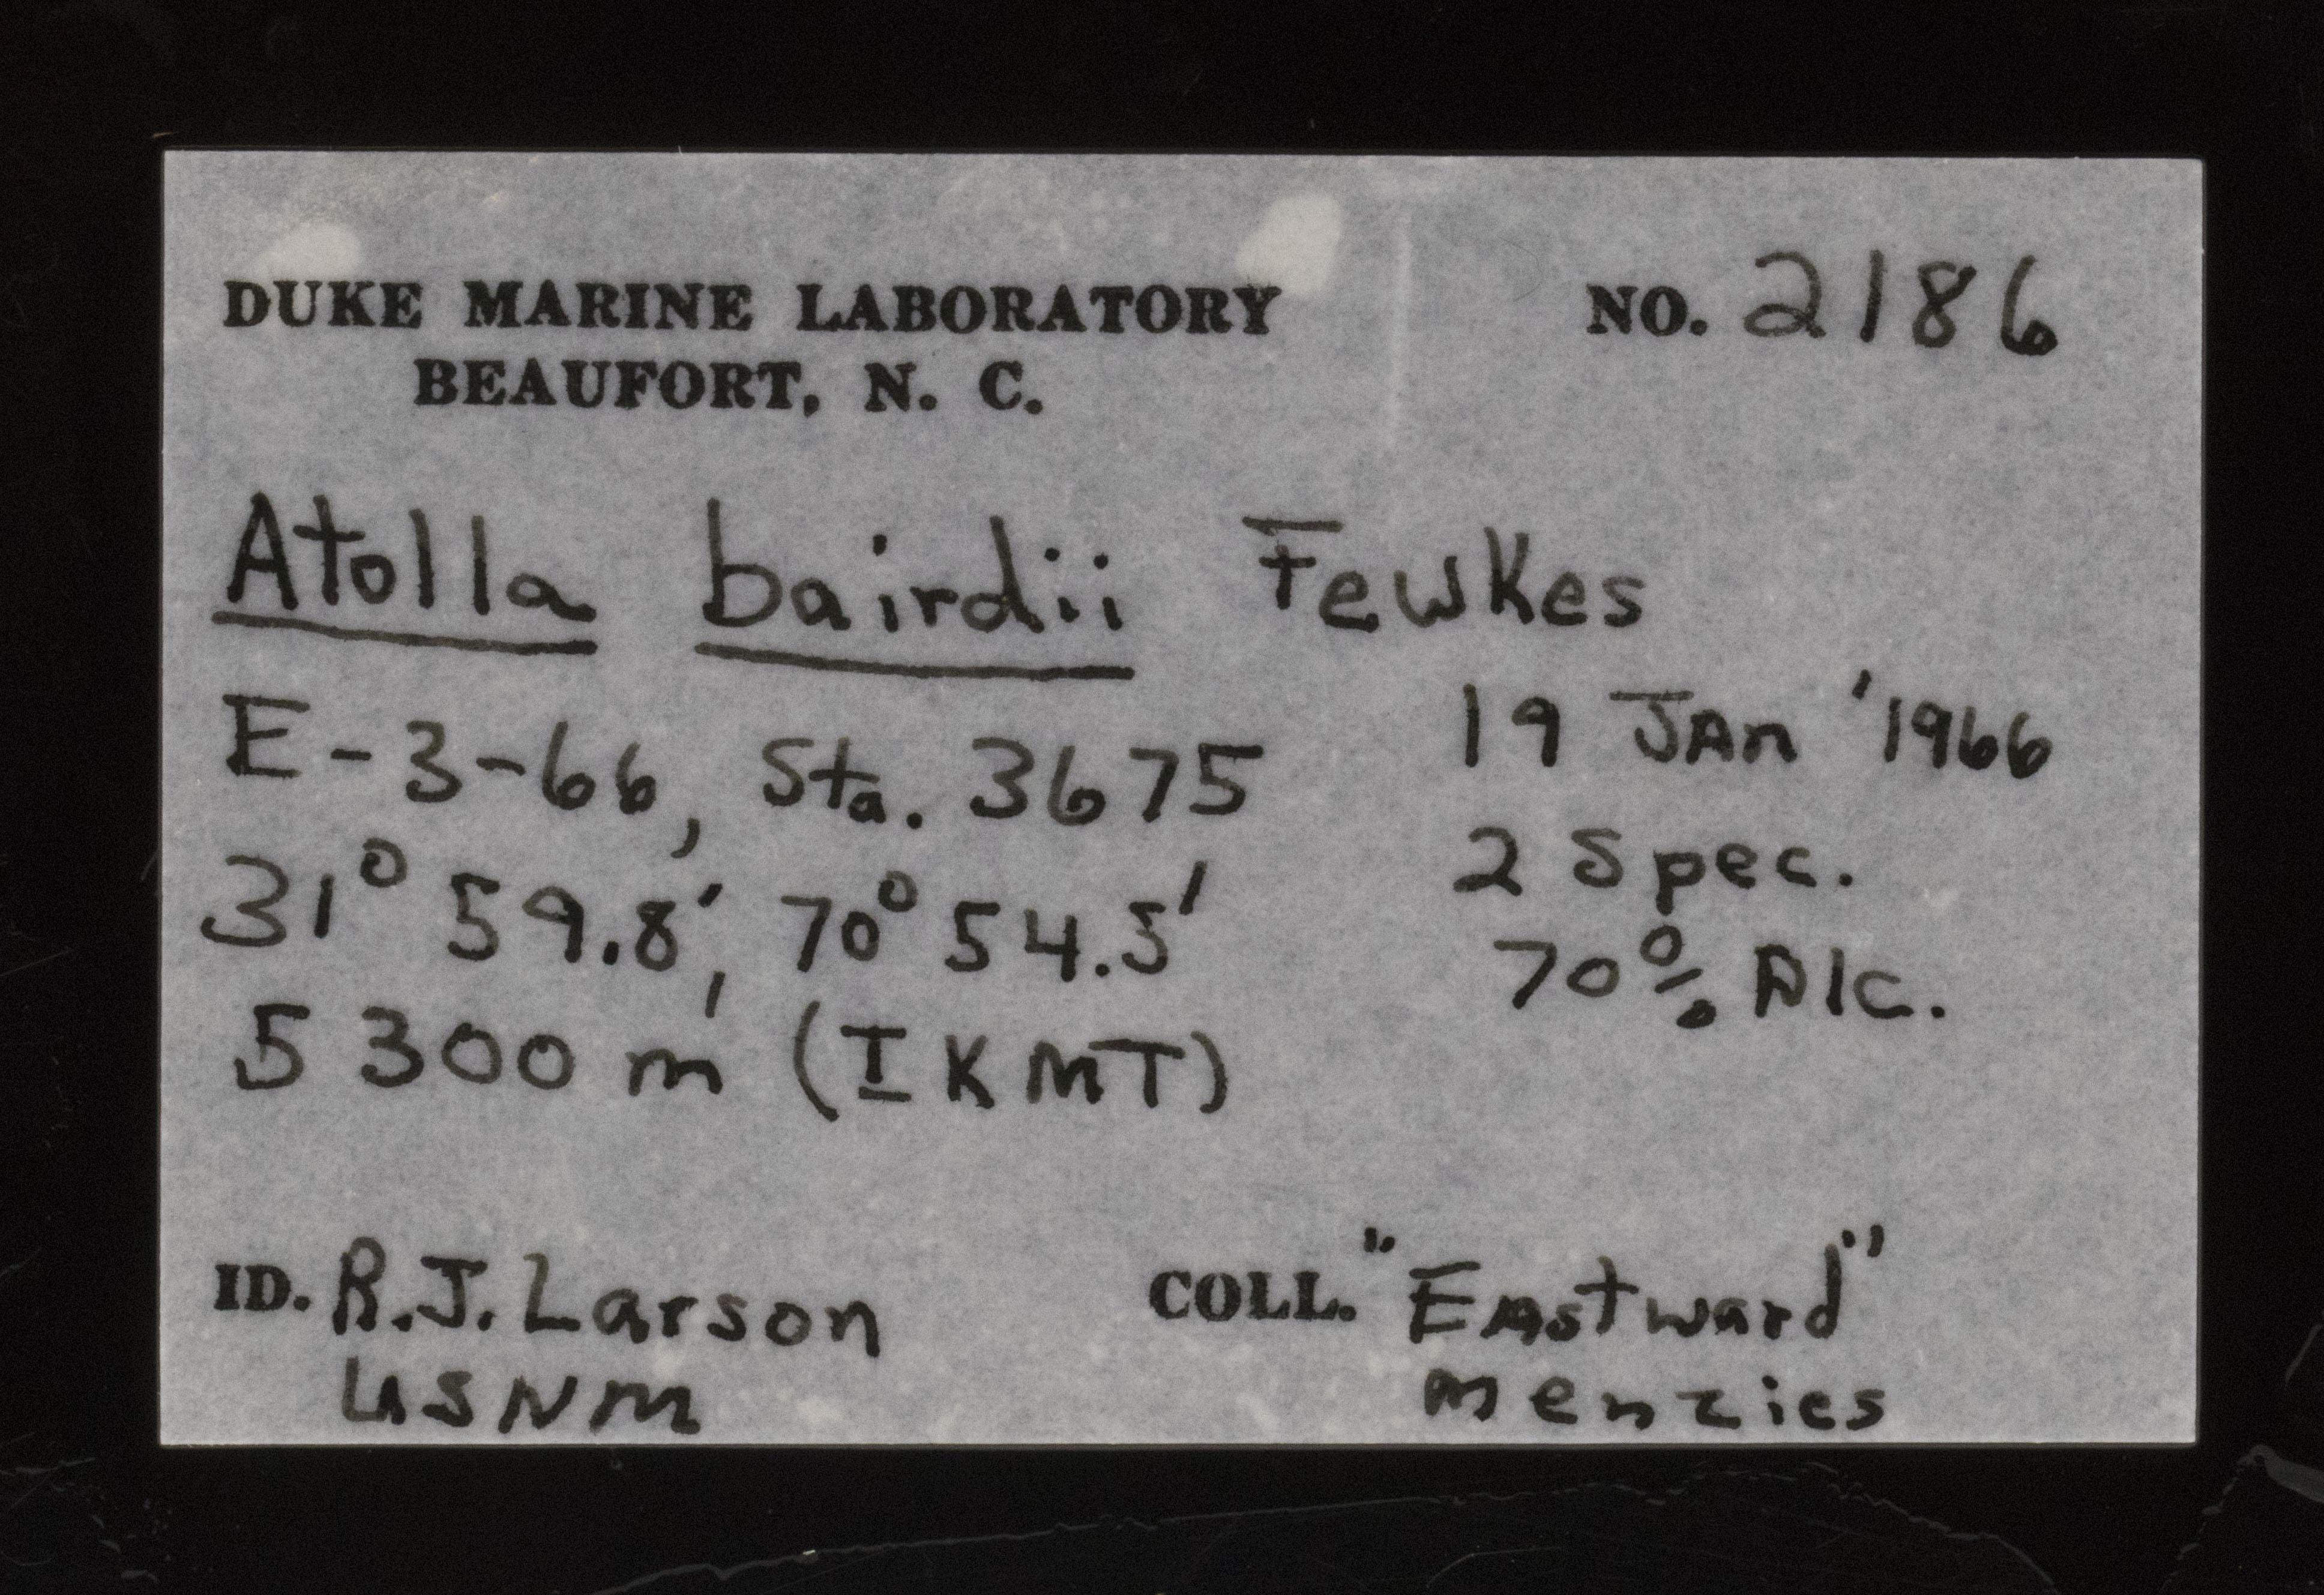 atollabairdii label